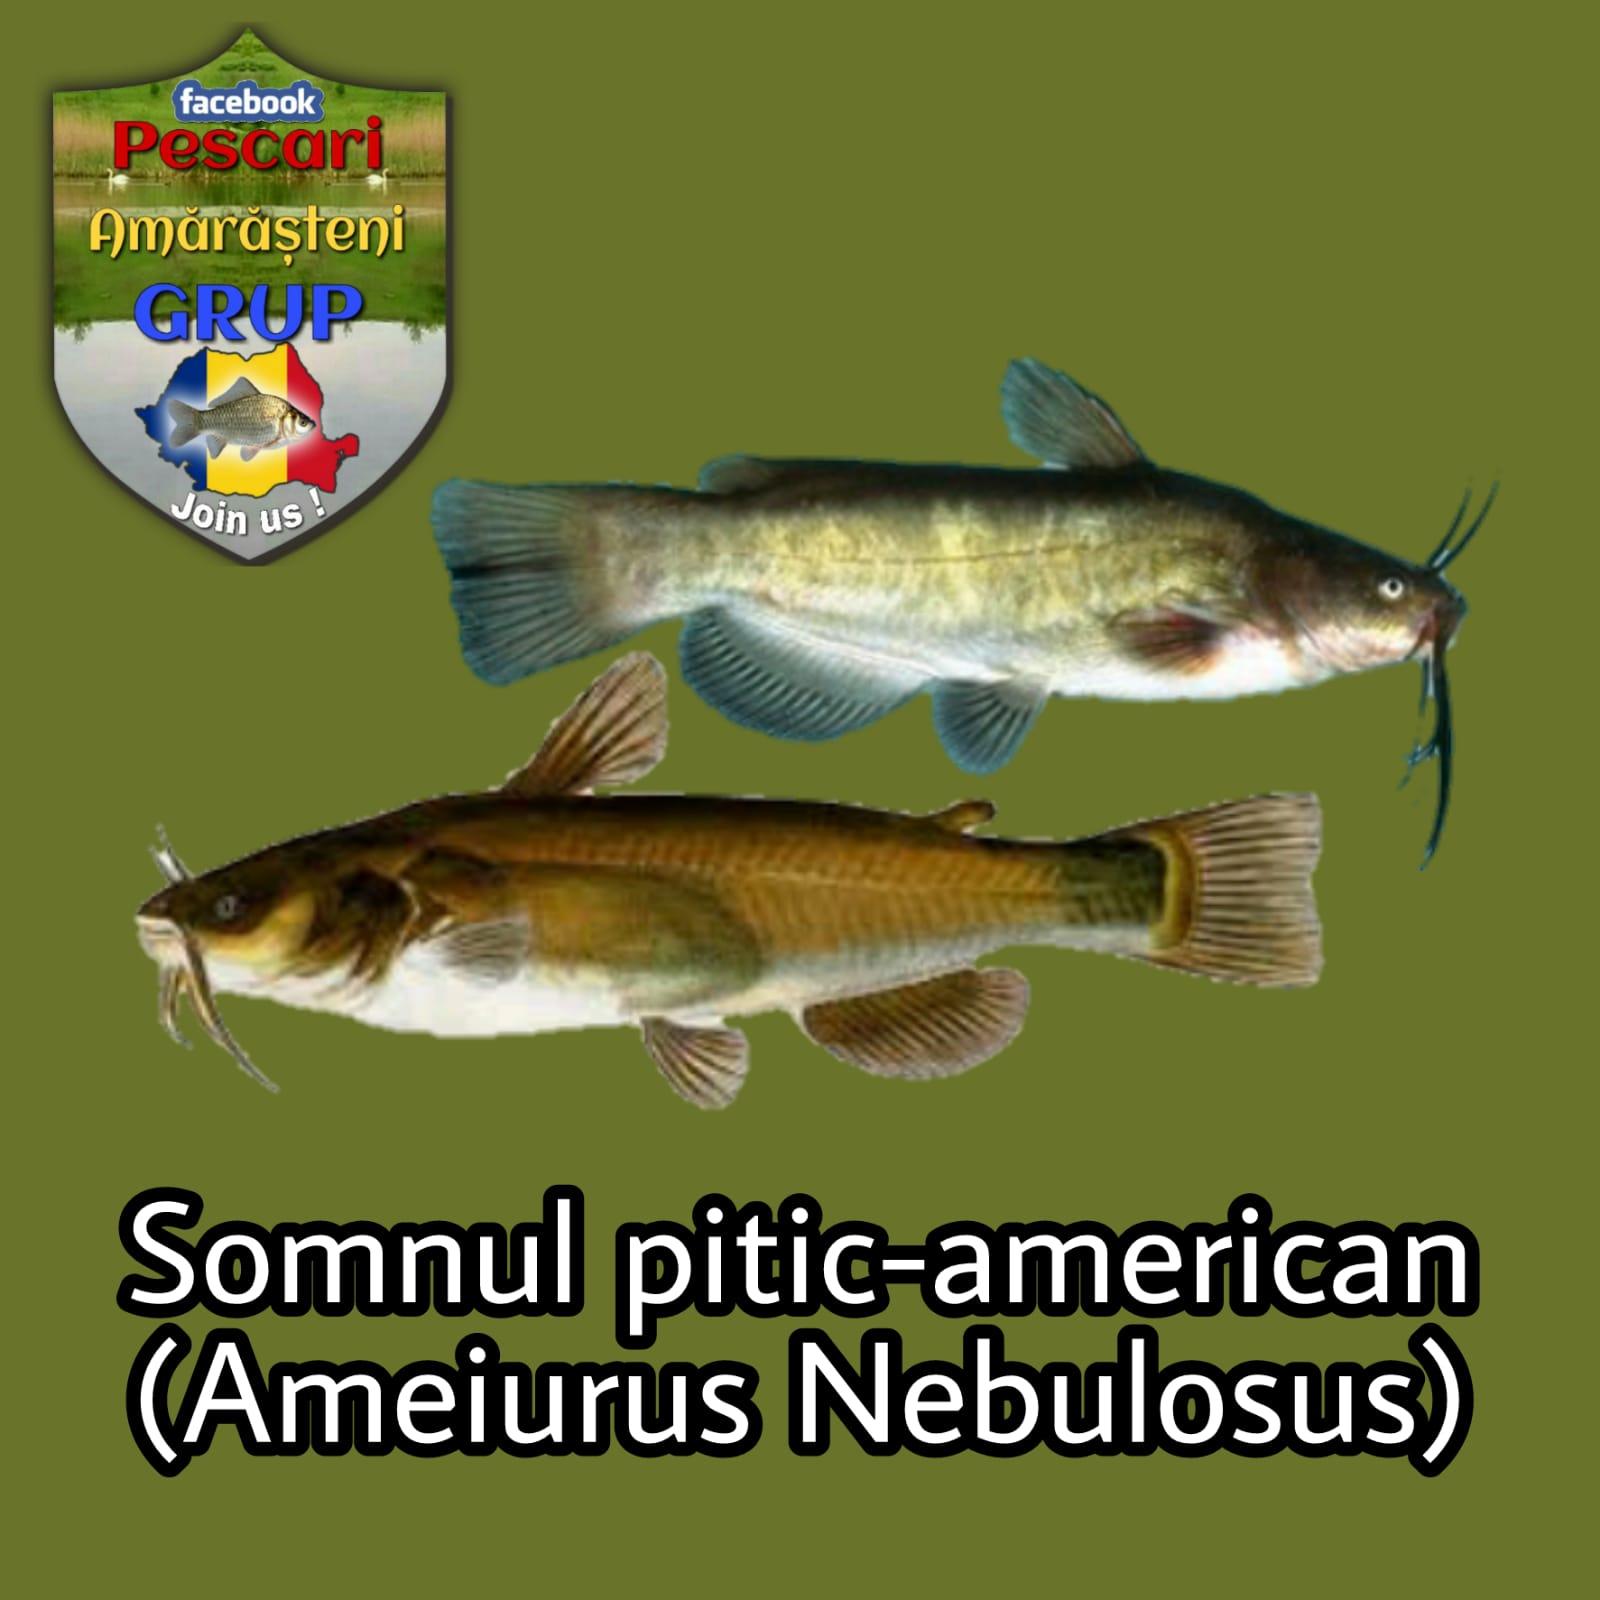 Somnul pitic american, (Ameiurus nebulosus)